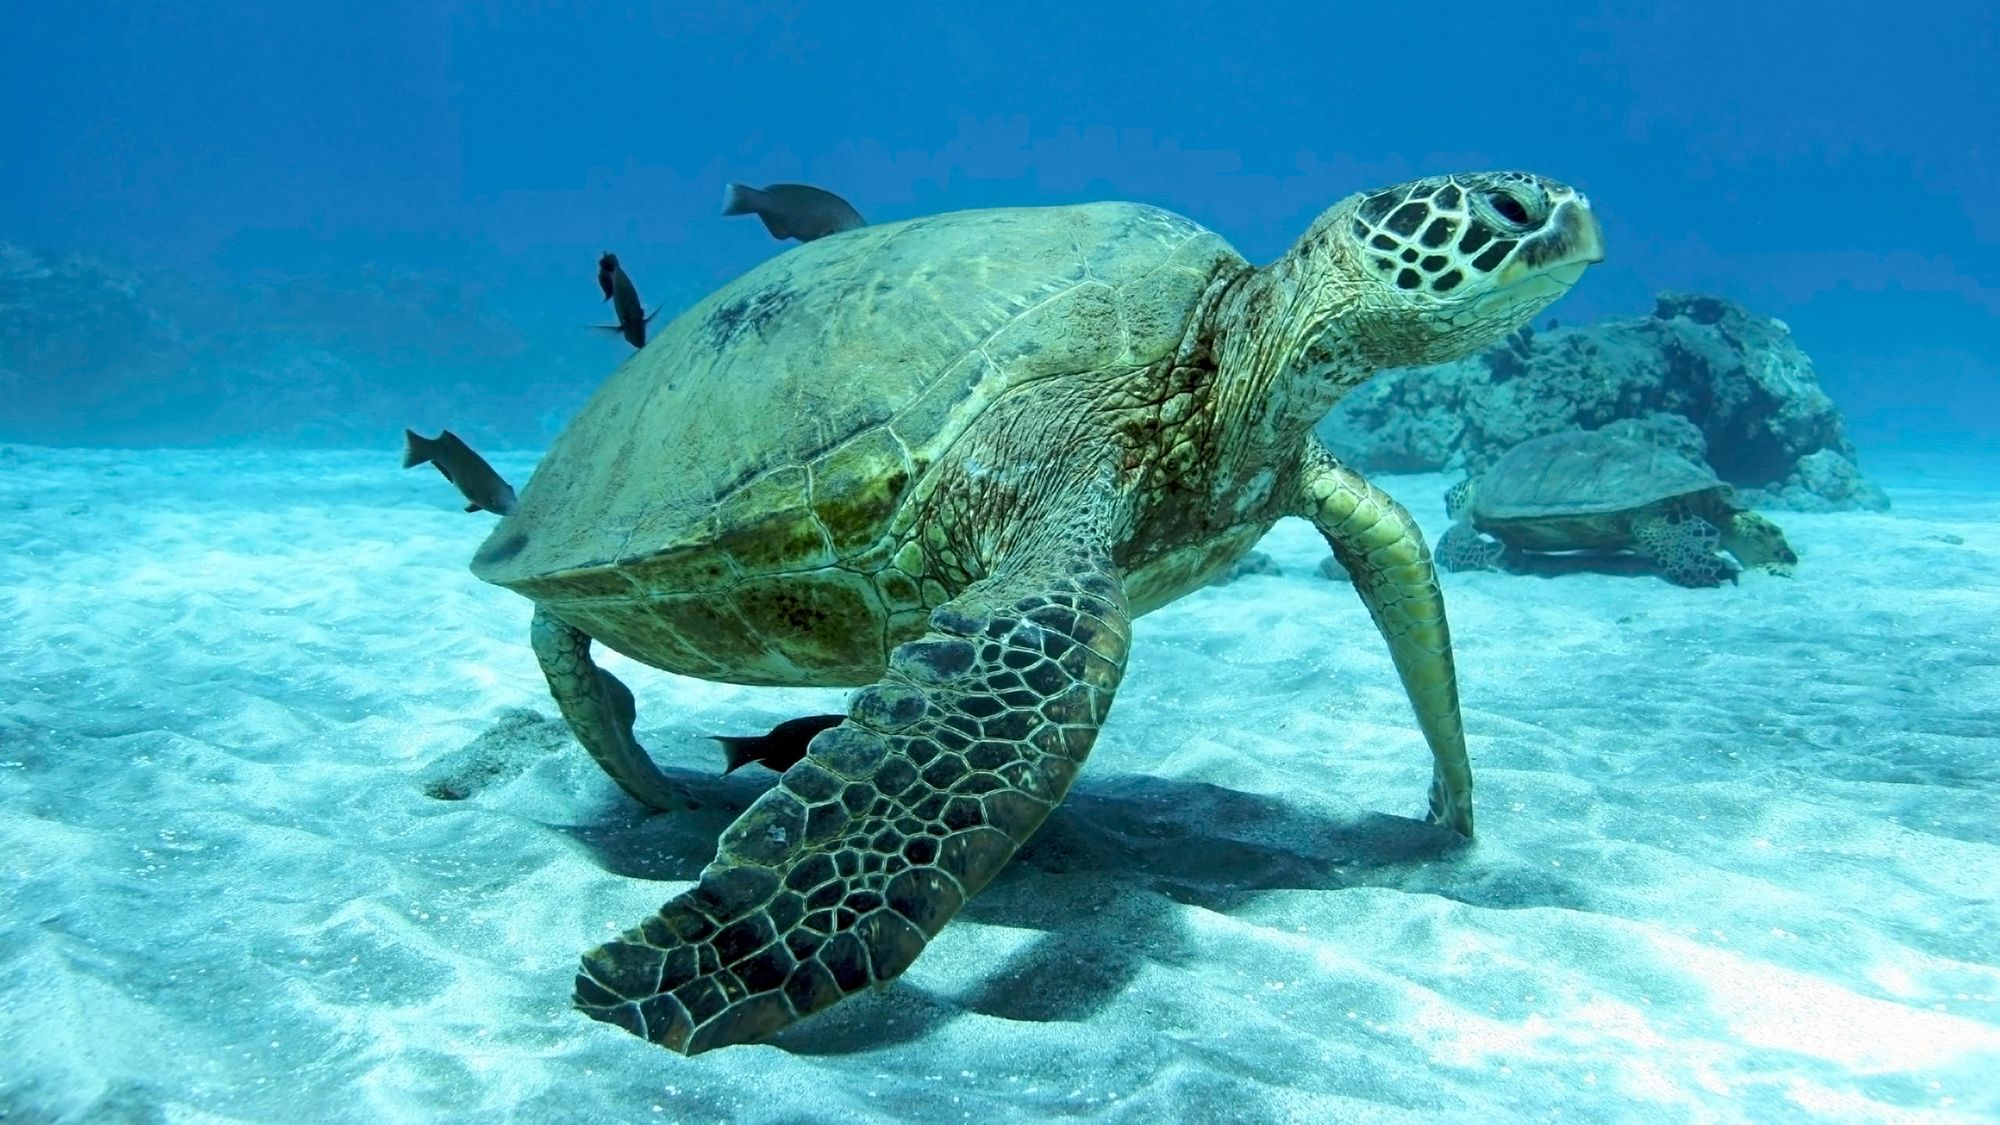 animales océano - tortugas